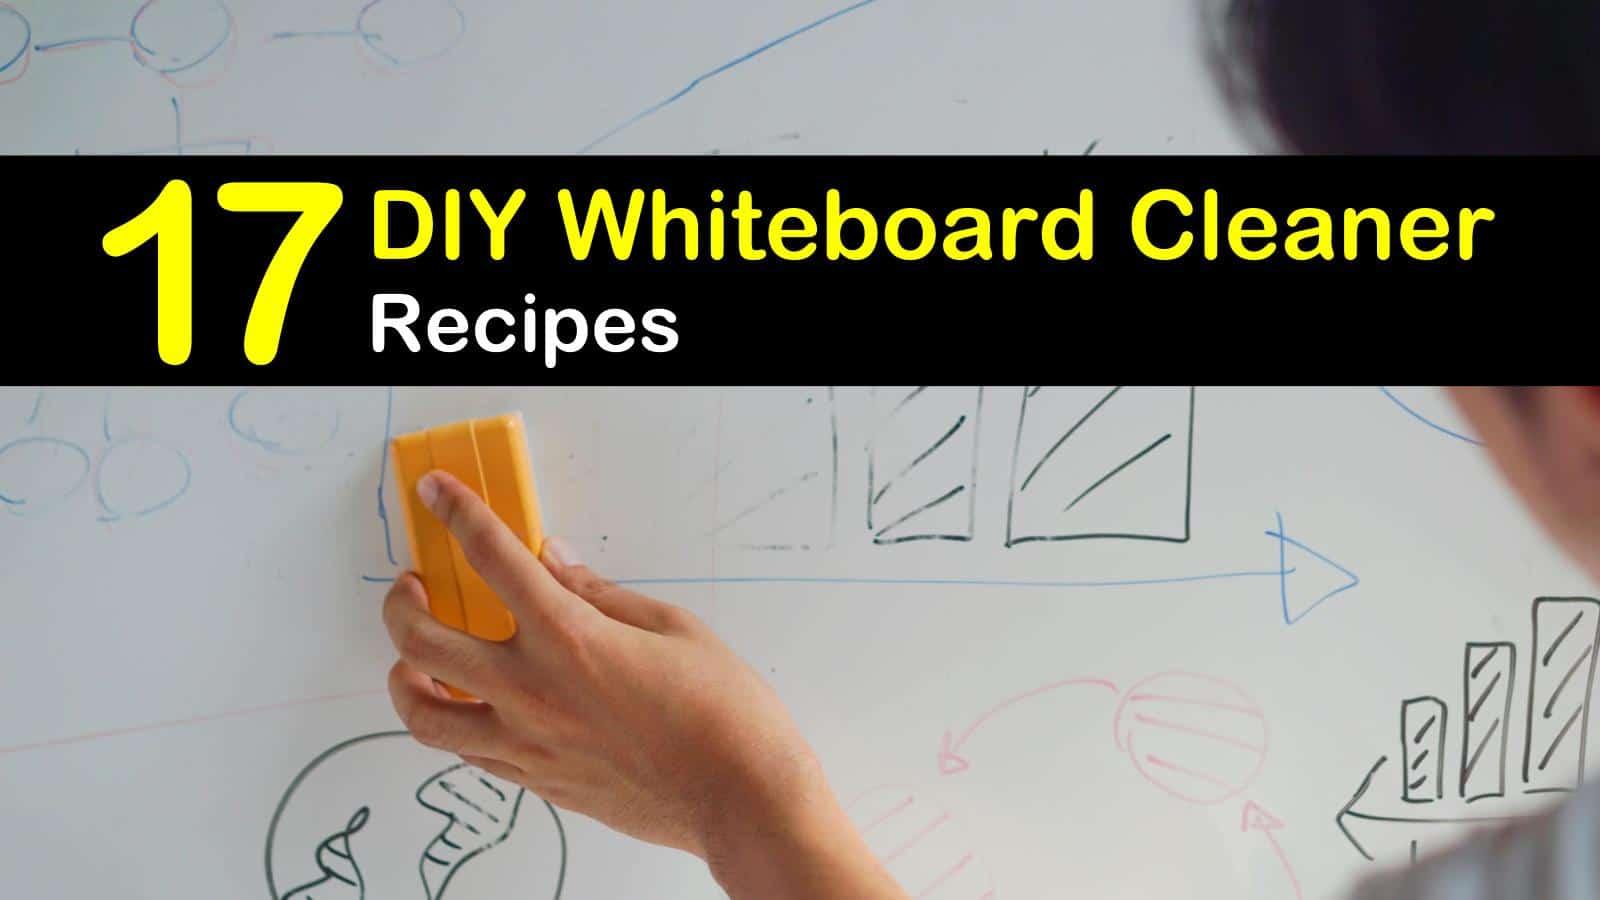 diy whiteboard cleaner titleimg1